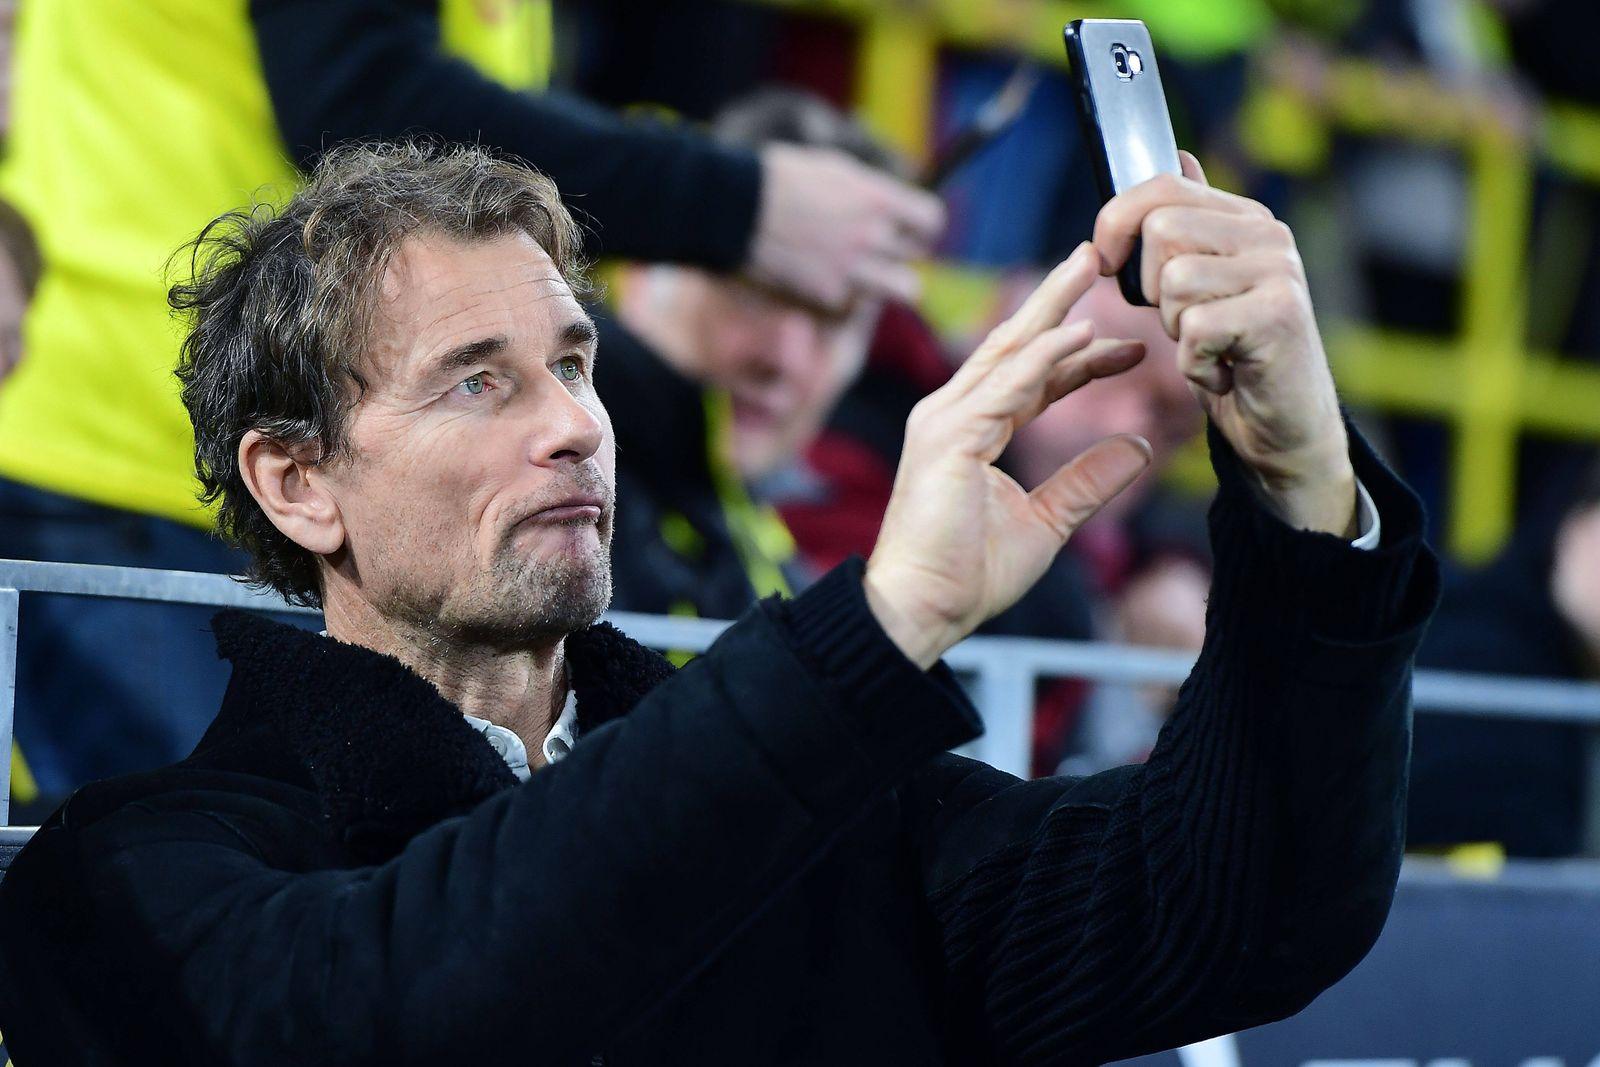 Fußball 1. Bundesliga 16. Spieltag Borussia Dortmund - RB Leipzig am 17.12.2019 im Signal Iduna Park in Dortmund Jens L